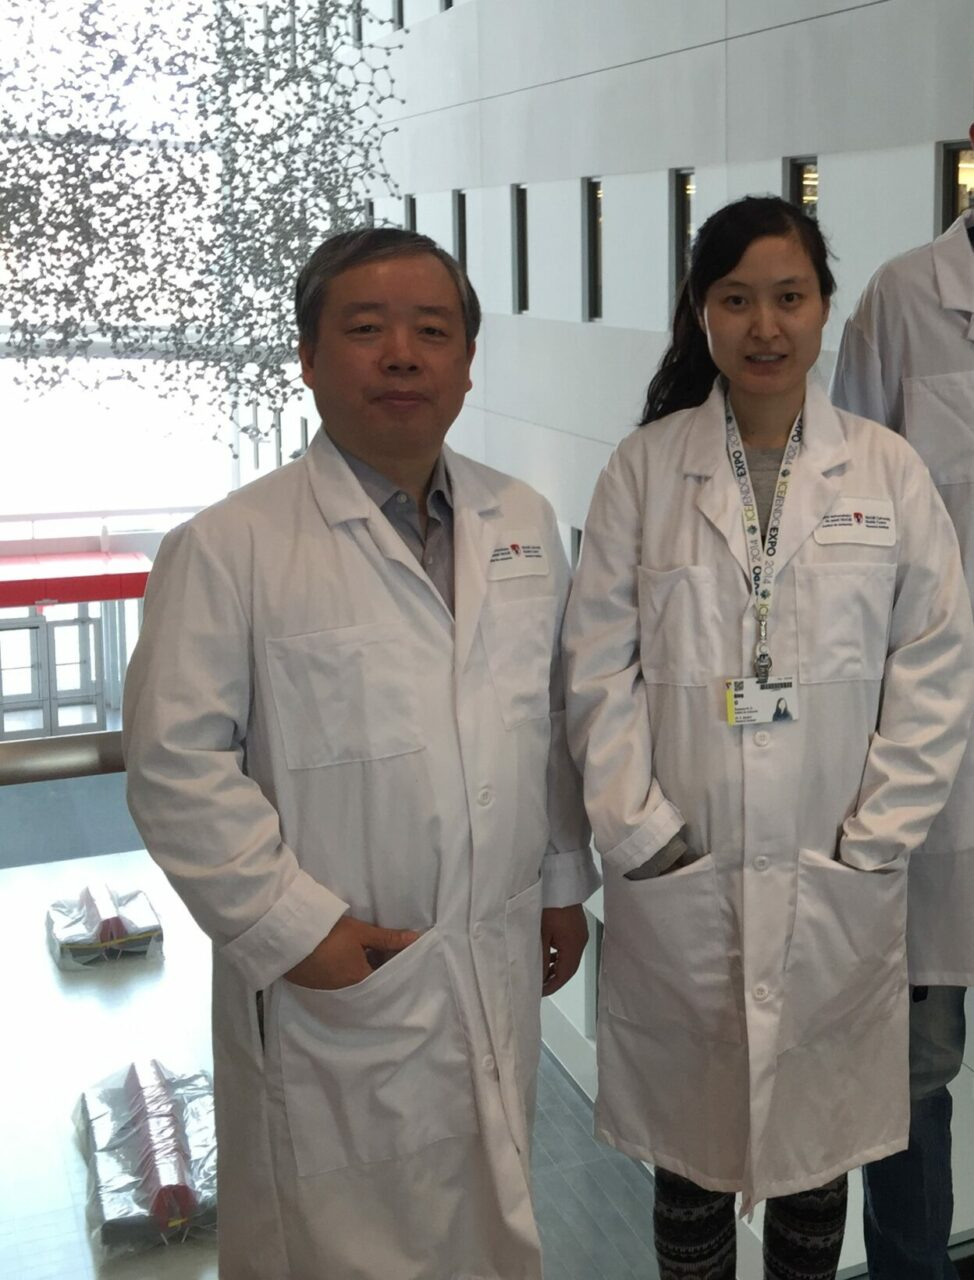 Dr. Jun-Li Liu (left) and graduate student Qing Li